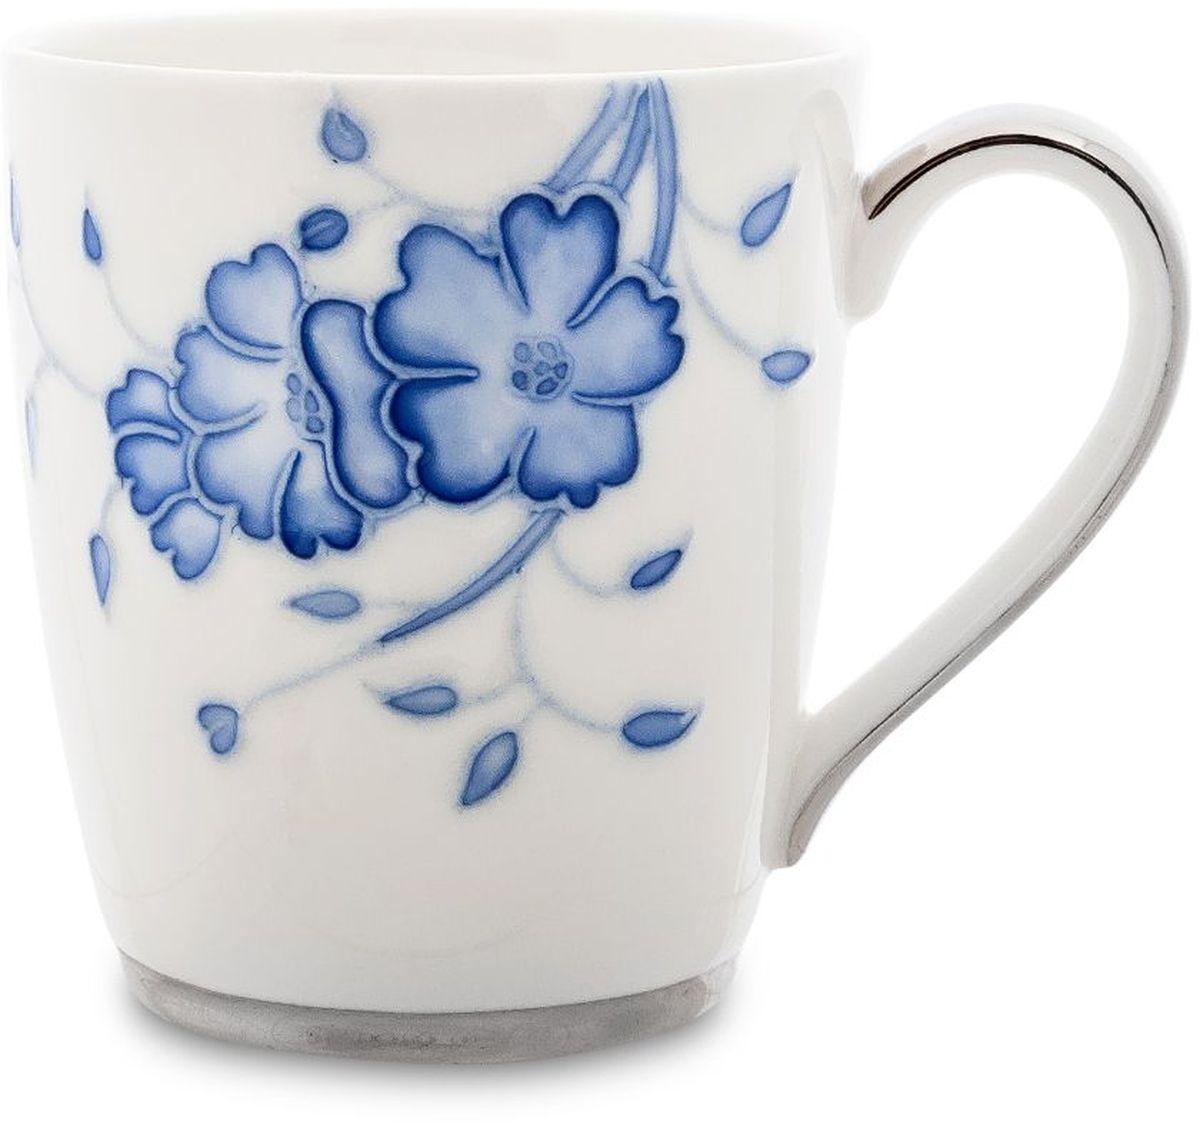 Кружка Pavone Голубая бабочка, 300 мл. 451605451605Высота: 9 см